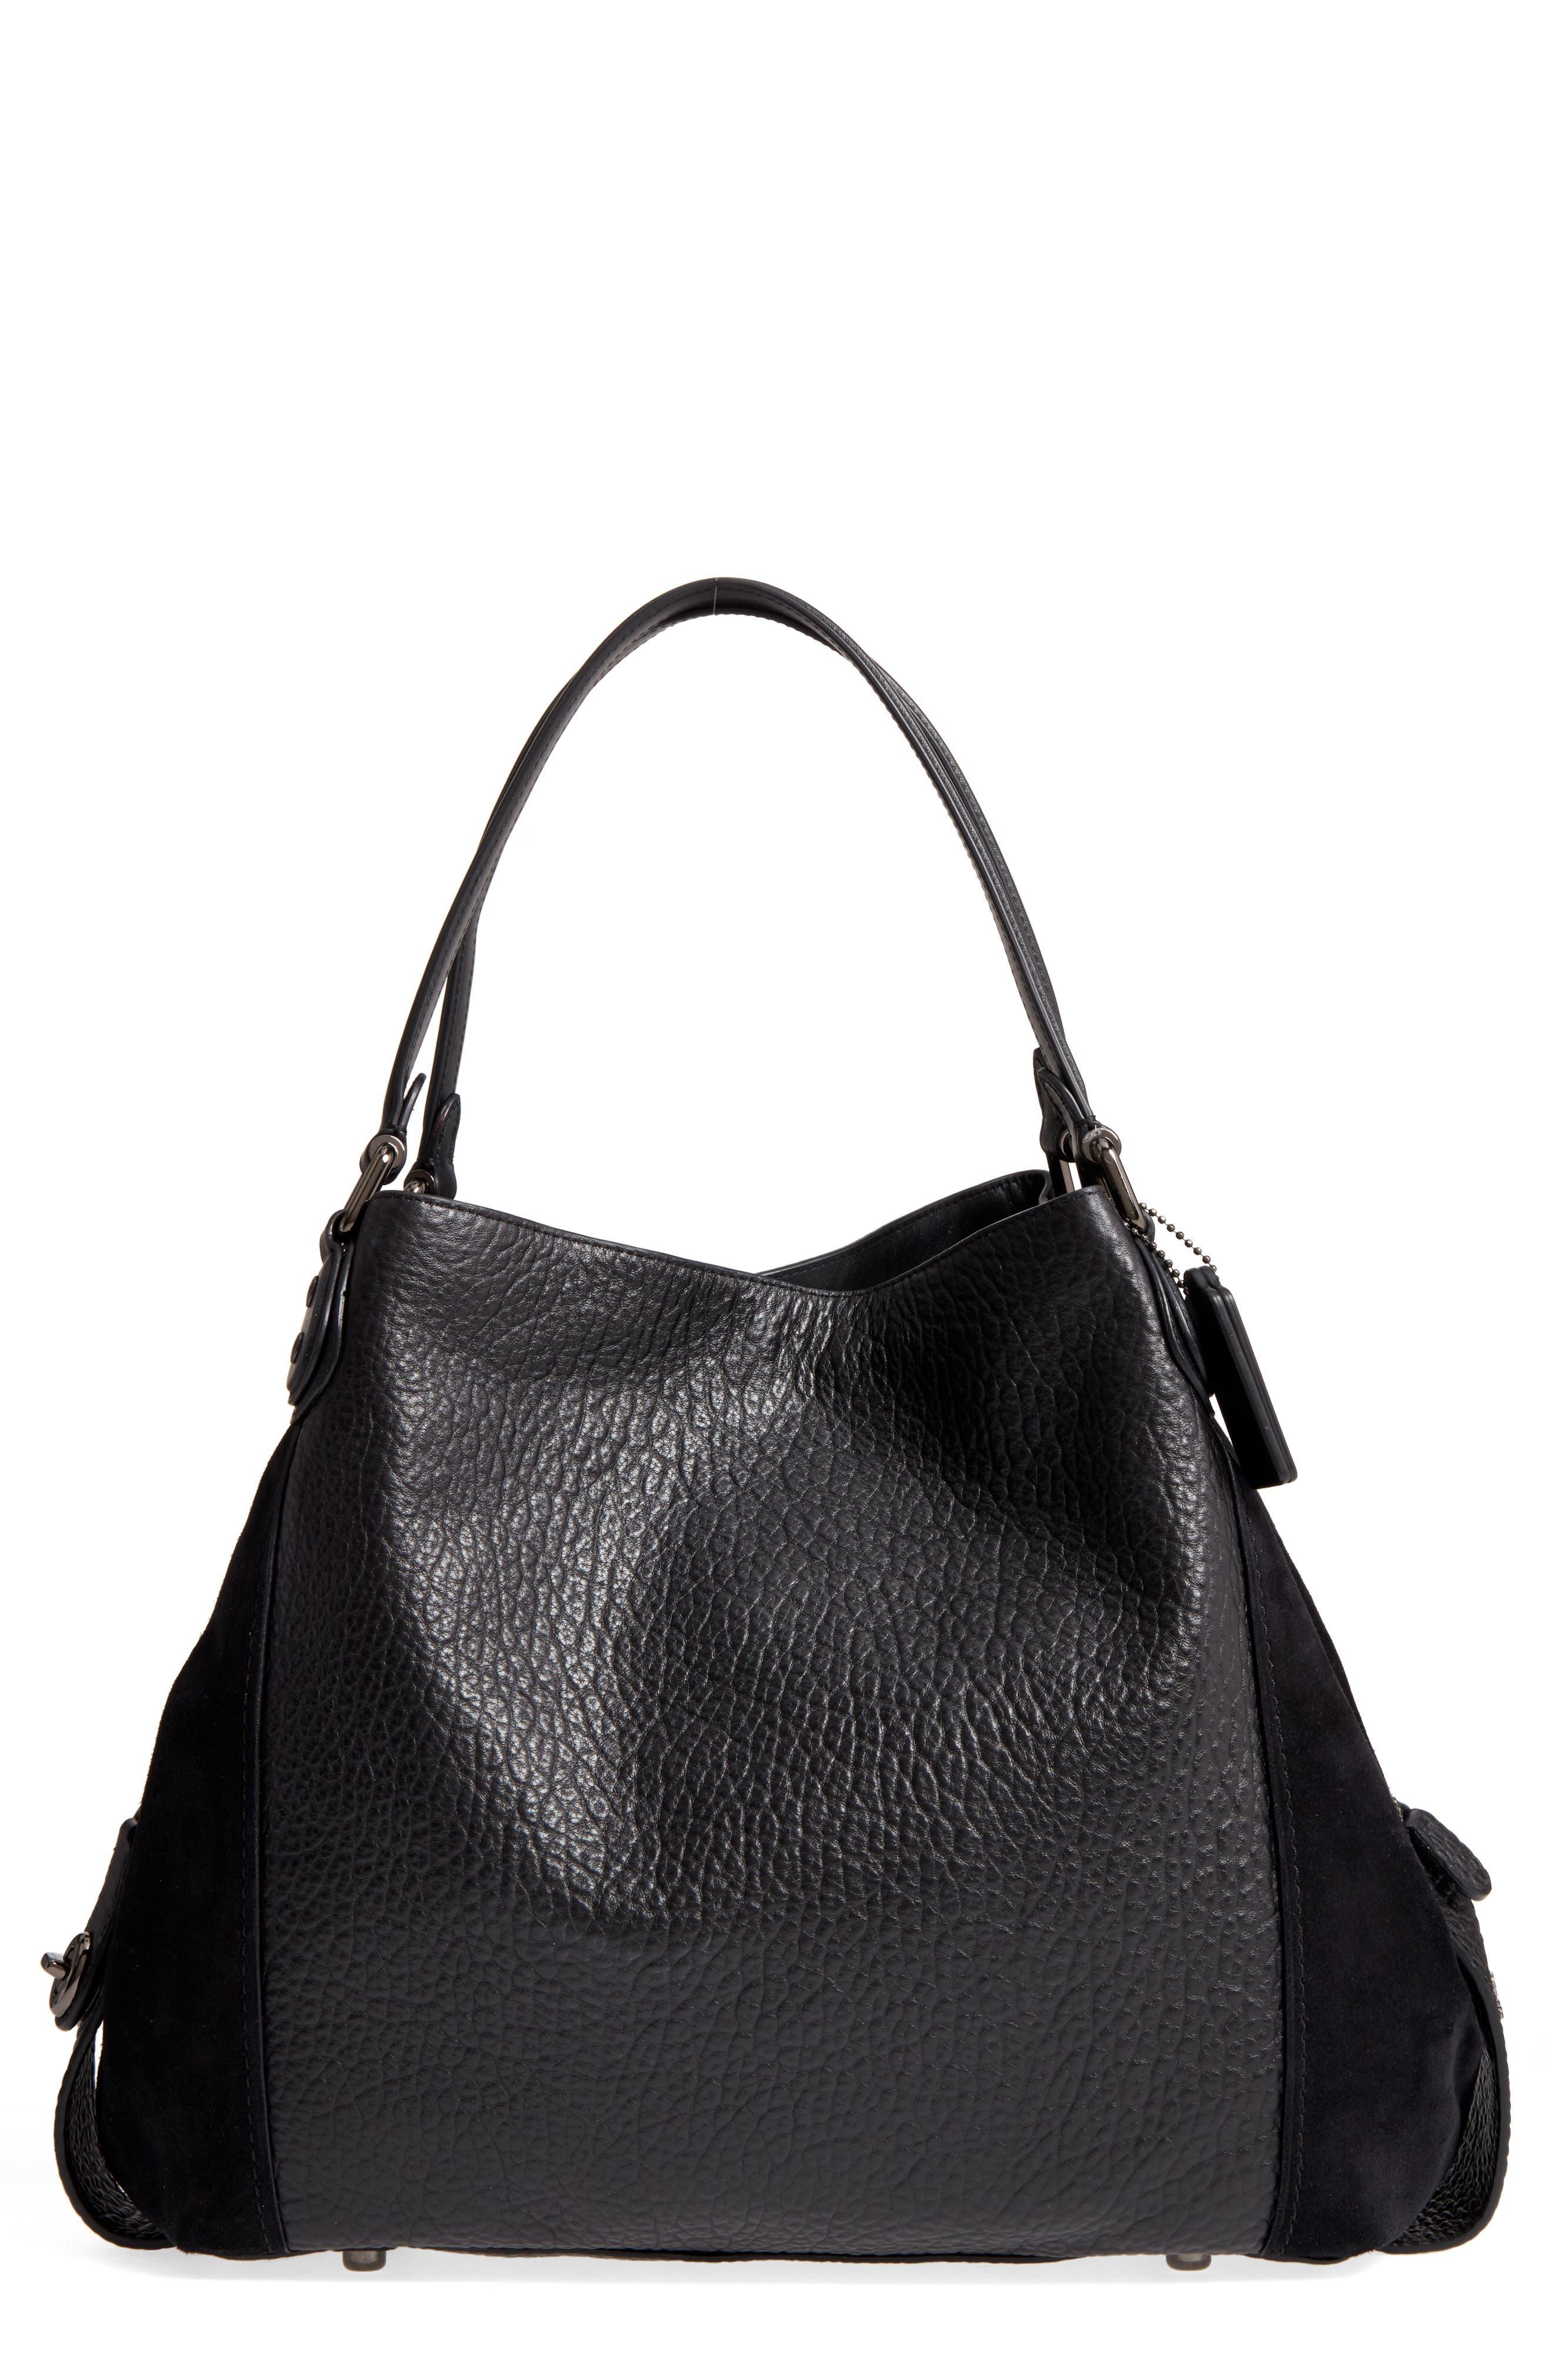 Main Image - COACH Edie 42 Leather & Suede Shoulder Bag